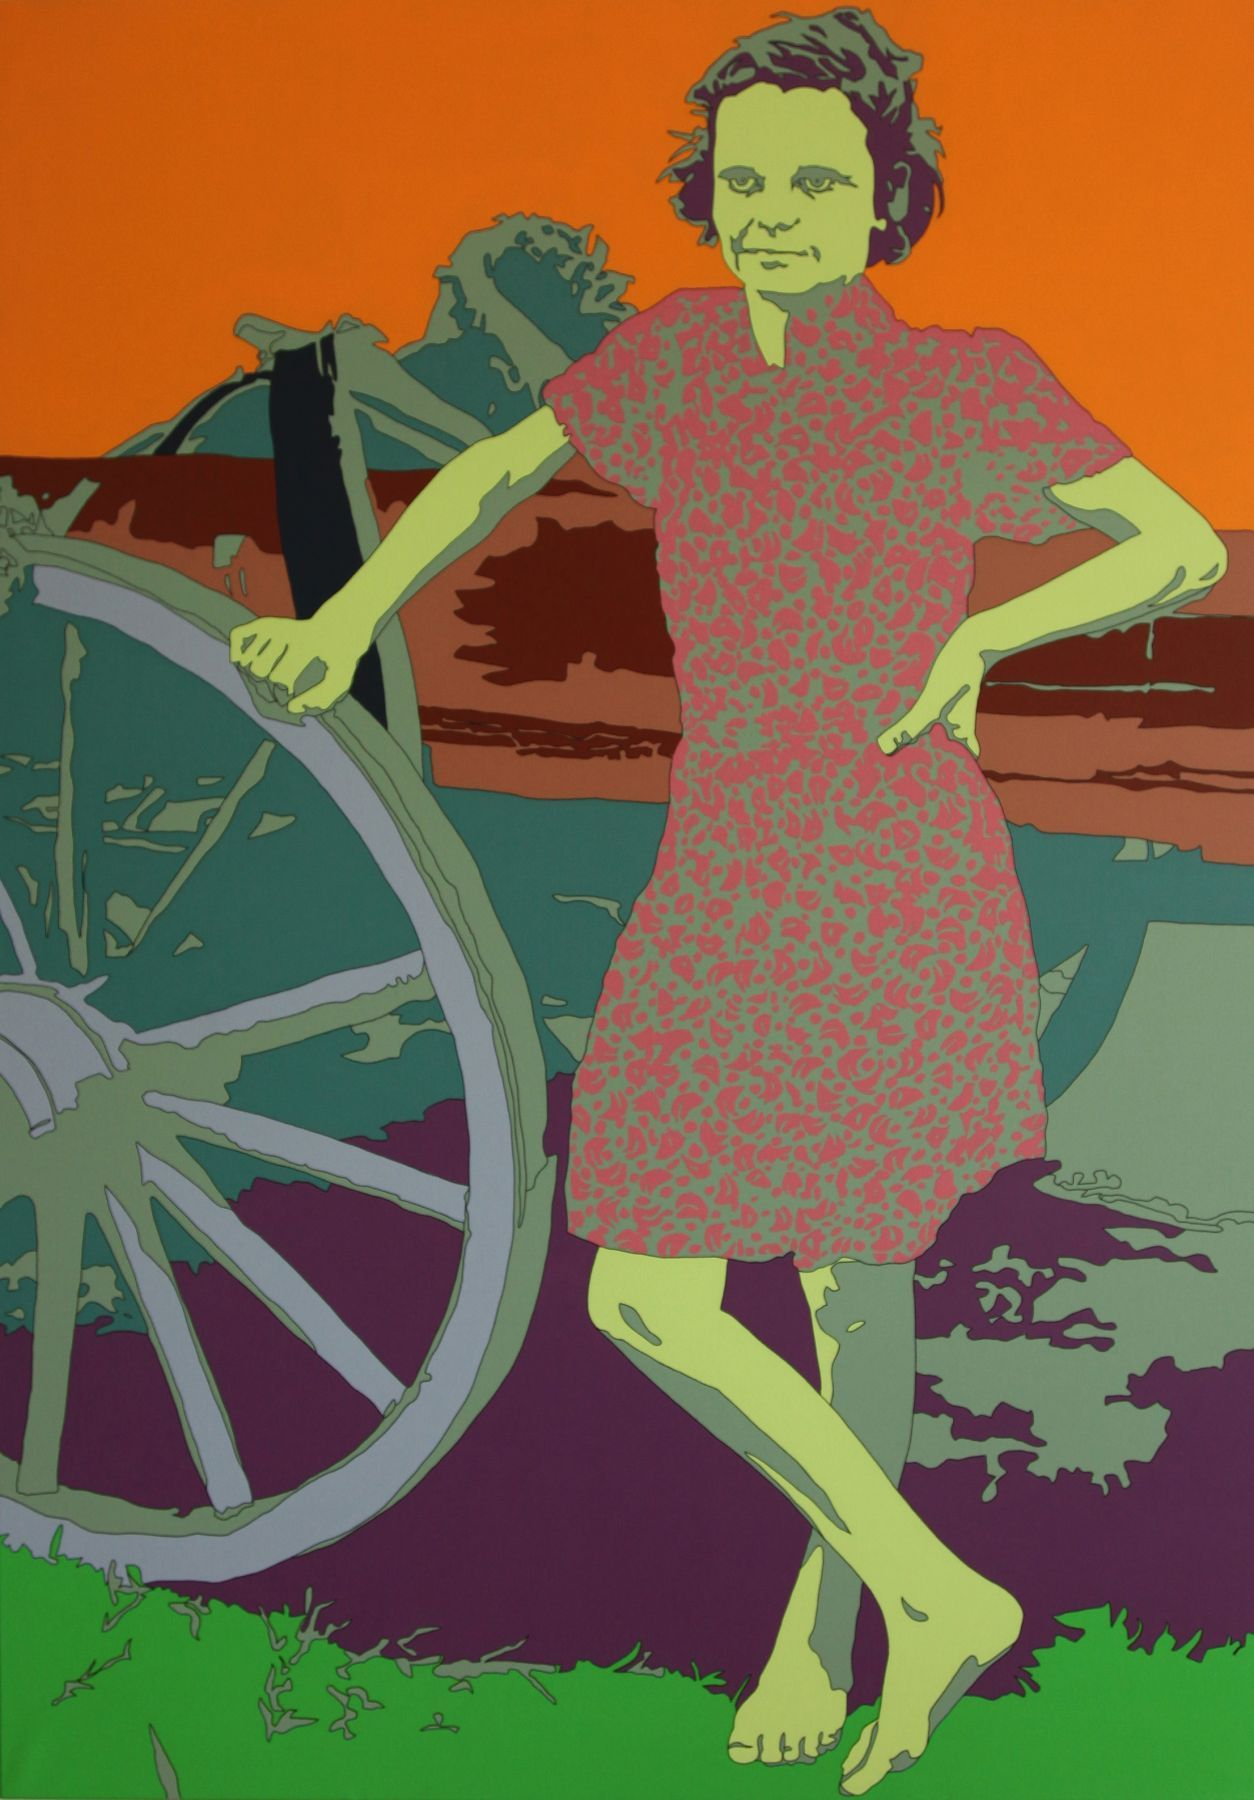 Russell Lee: Farm girl leaning on wagon, near Morganza, Louisiana, 2013